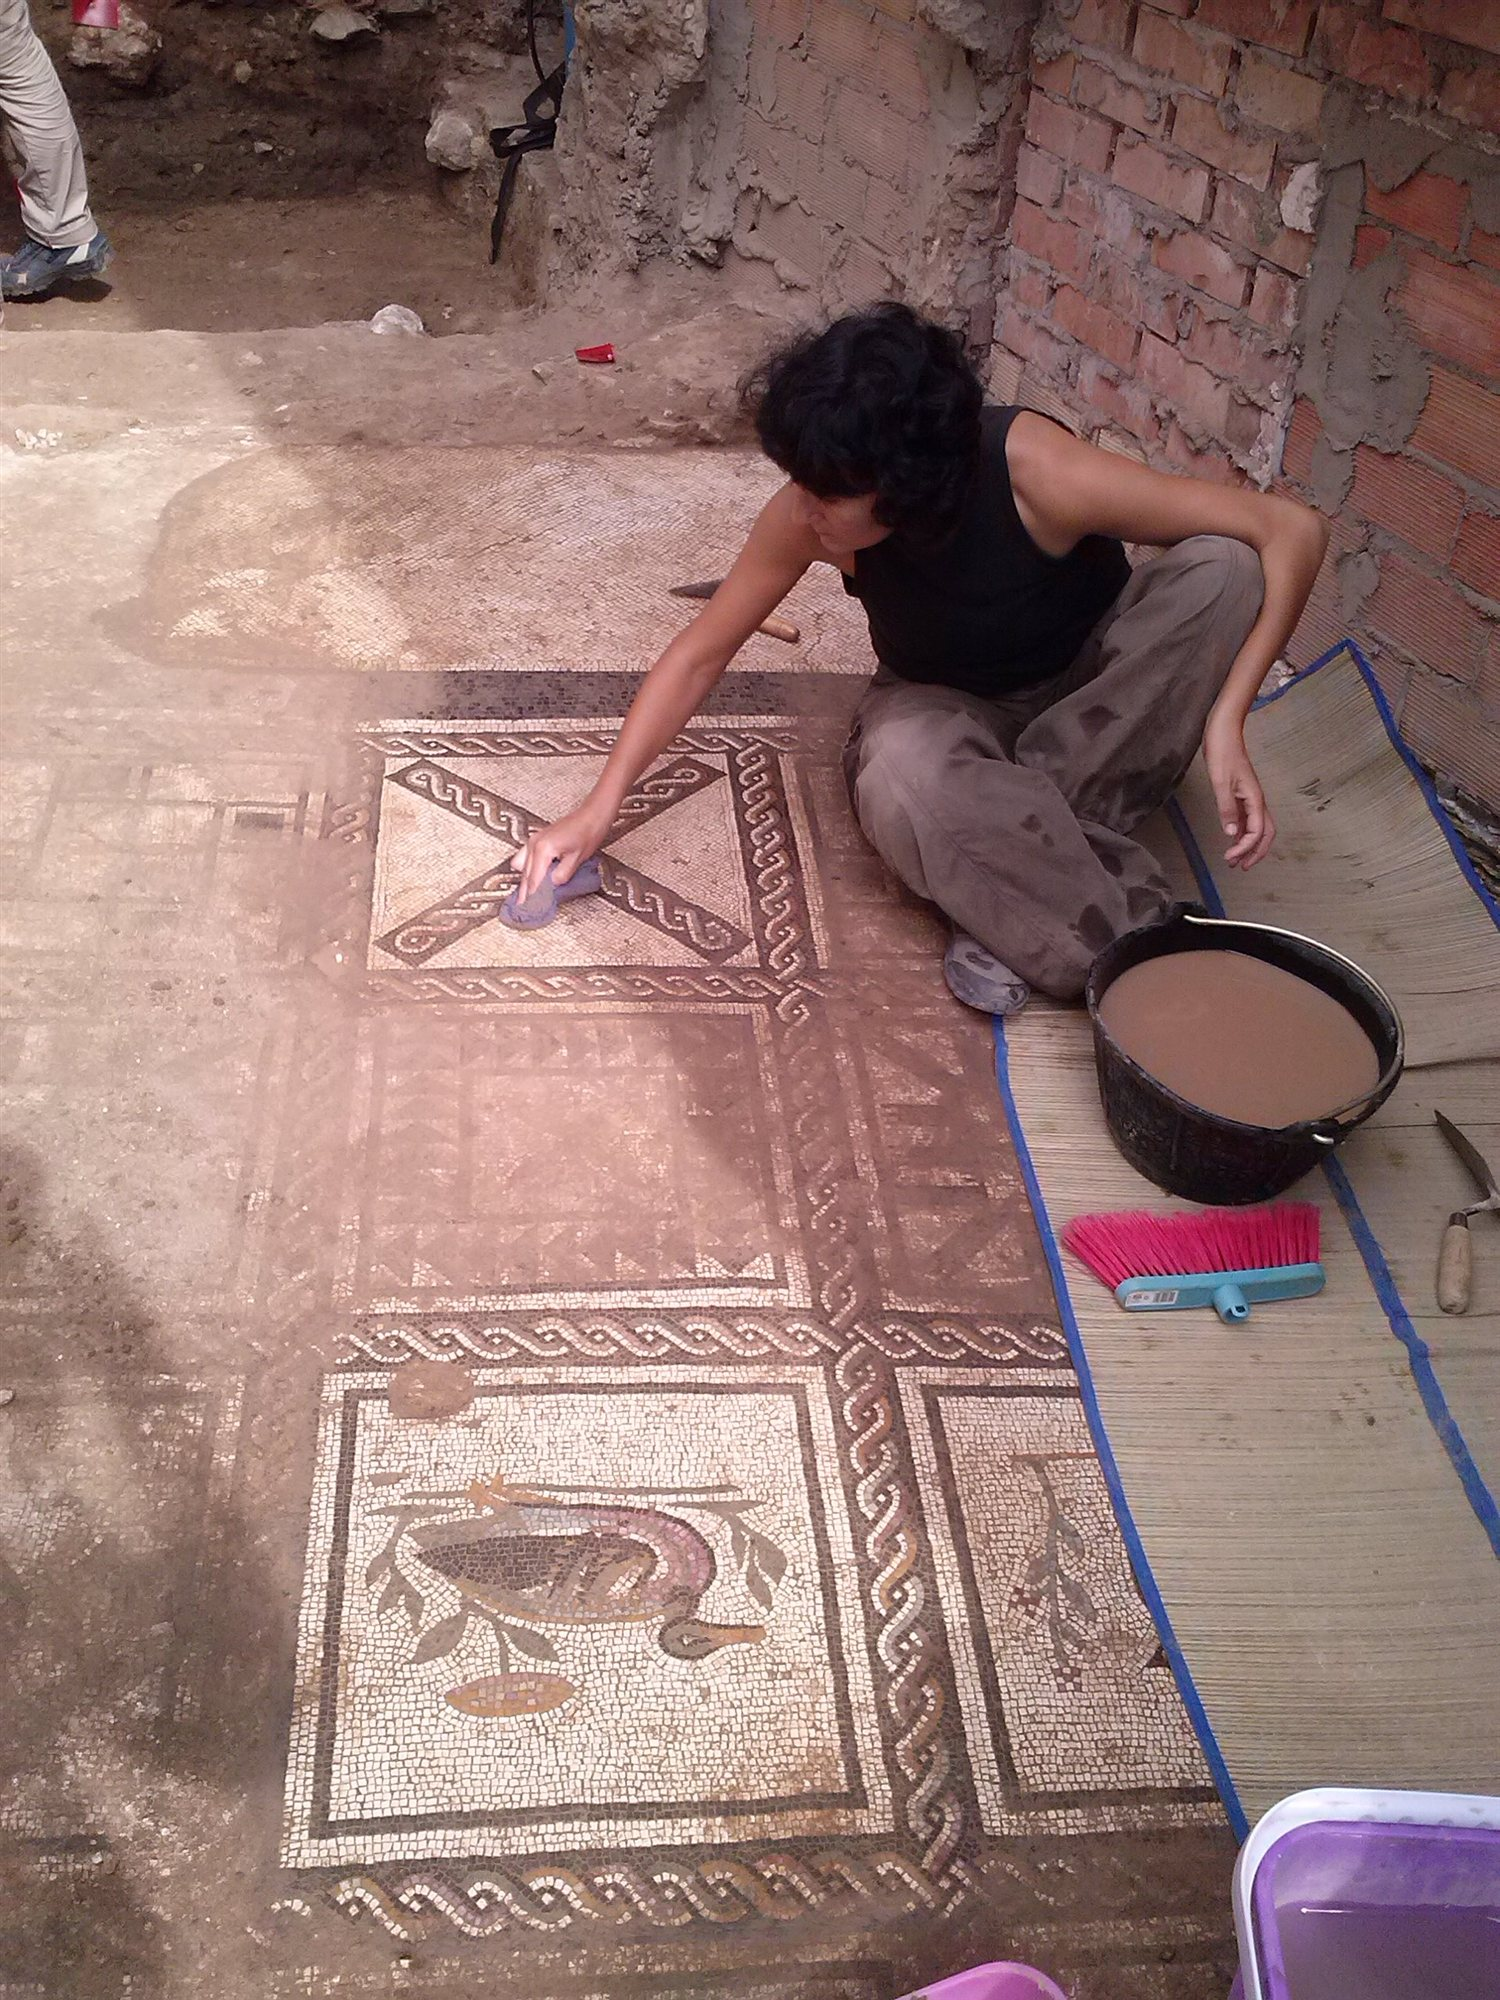 http://www.nationalgeographic.com.es/medio/2013/11/06/alcala_del_rio_1500x2000.JPG?random=1385748266286